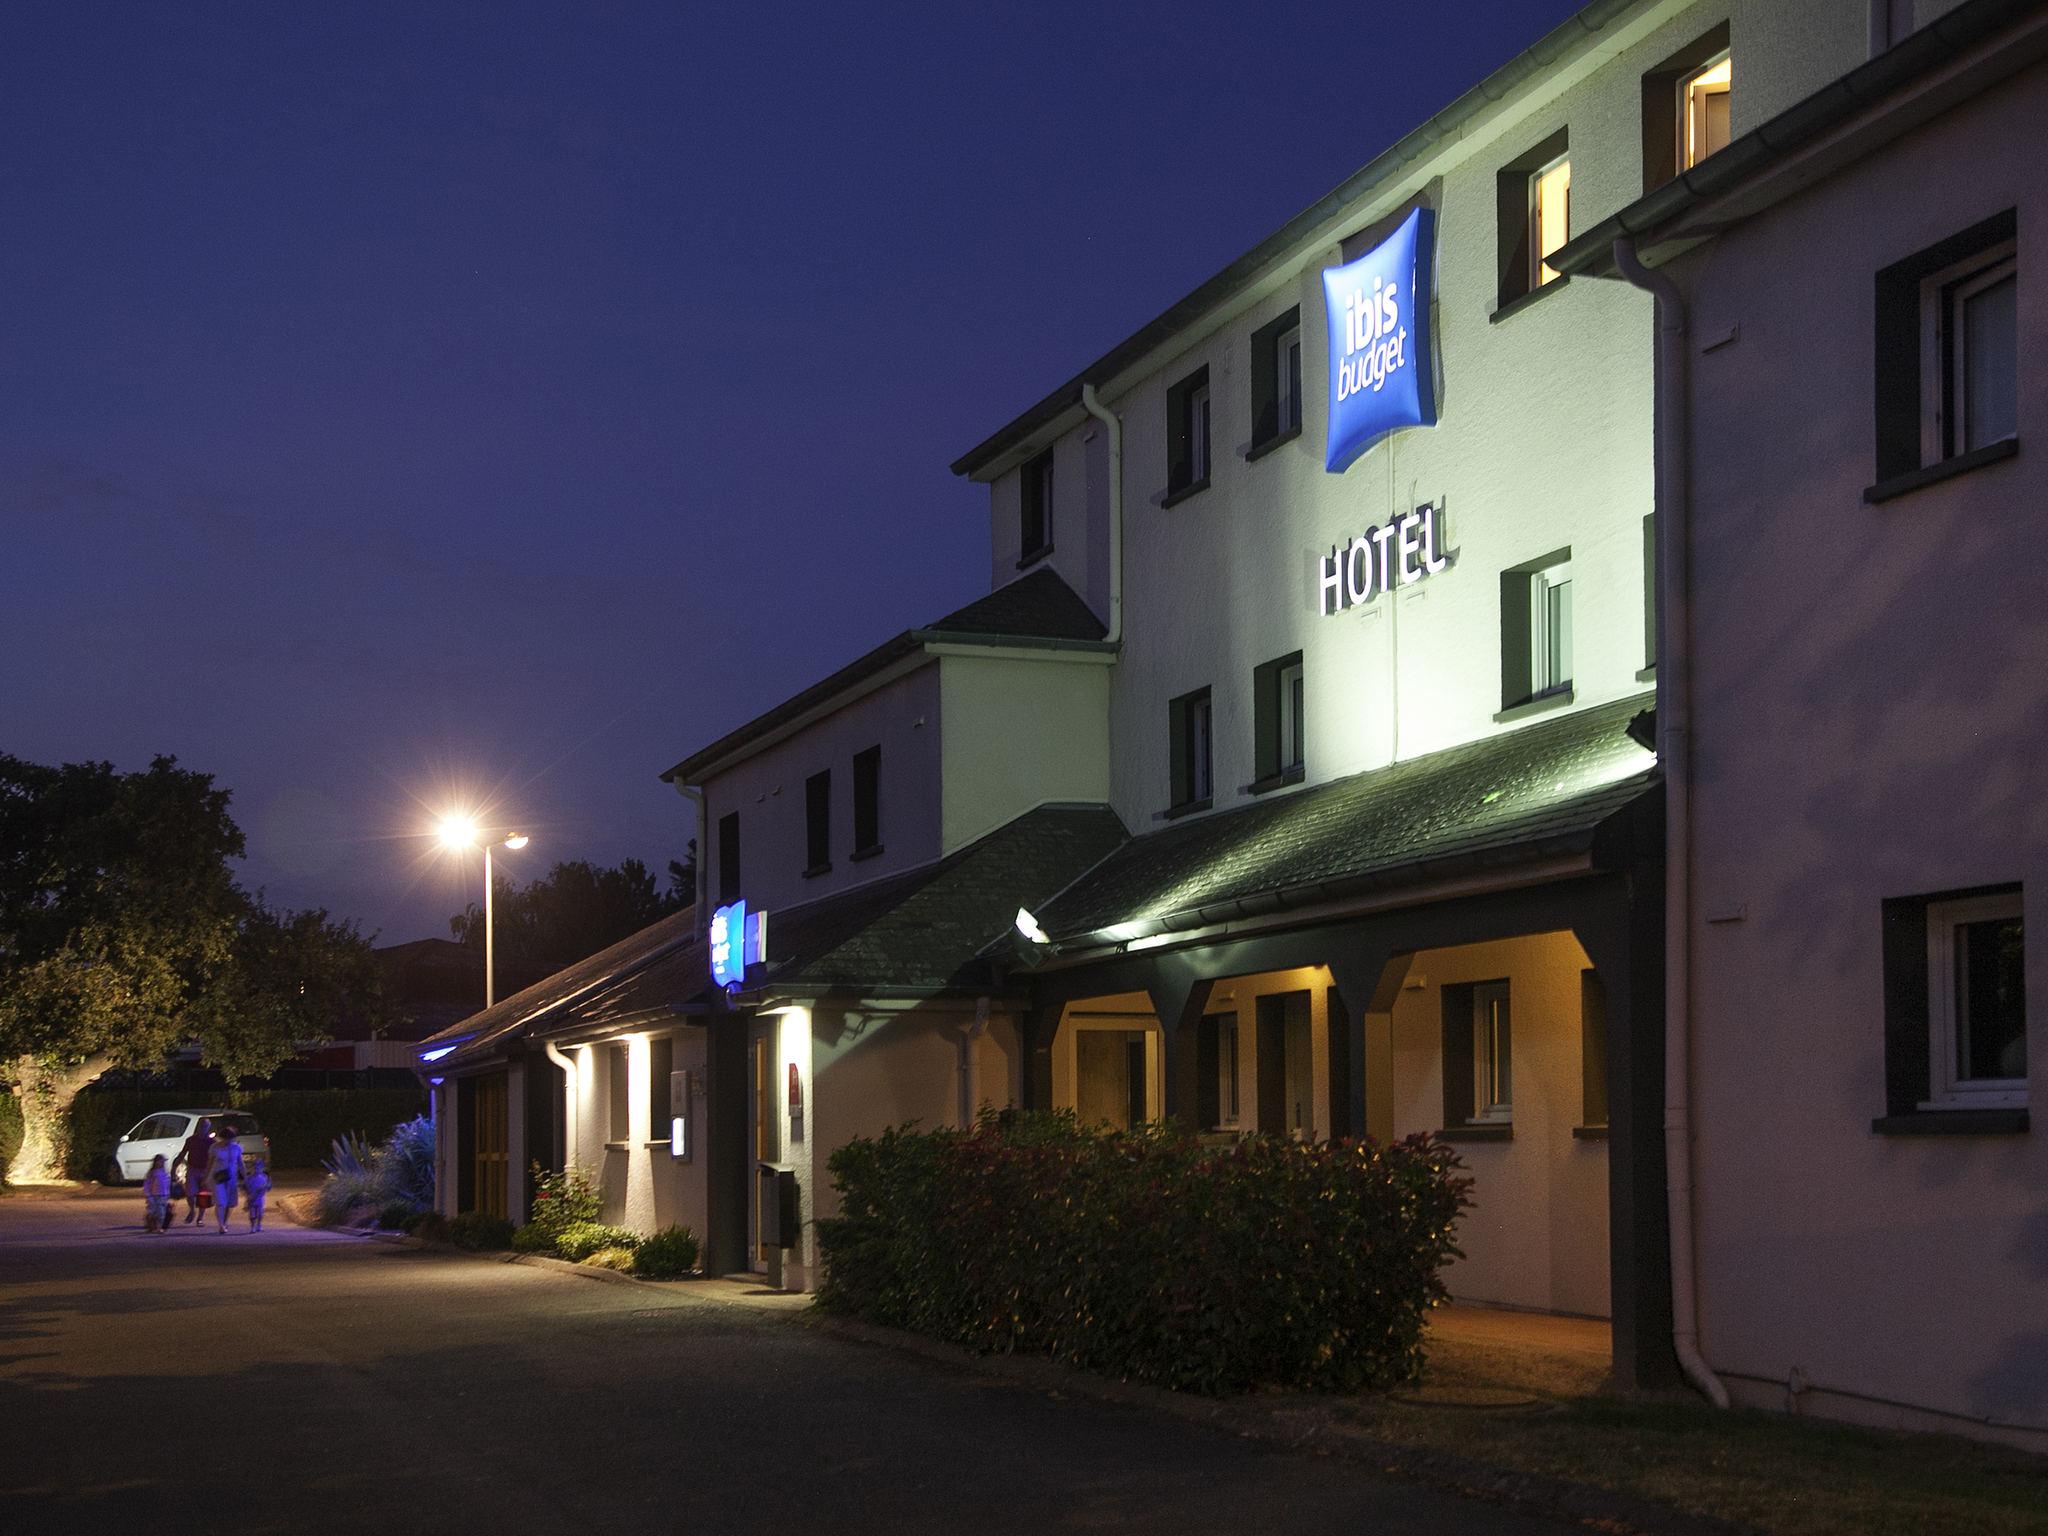 Hotel – ibis budget Nantes Sainte-Luce